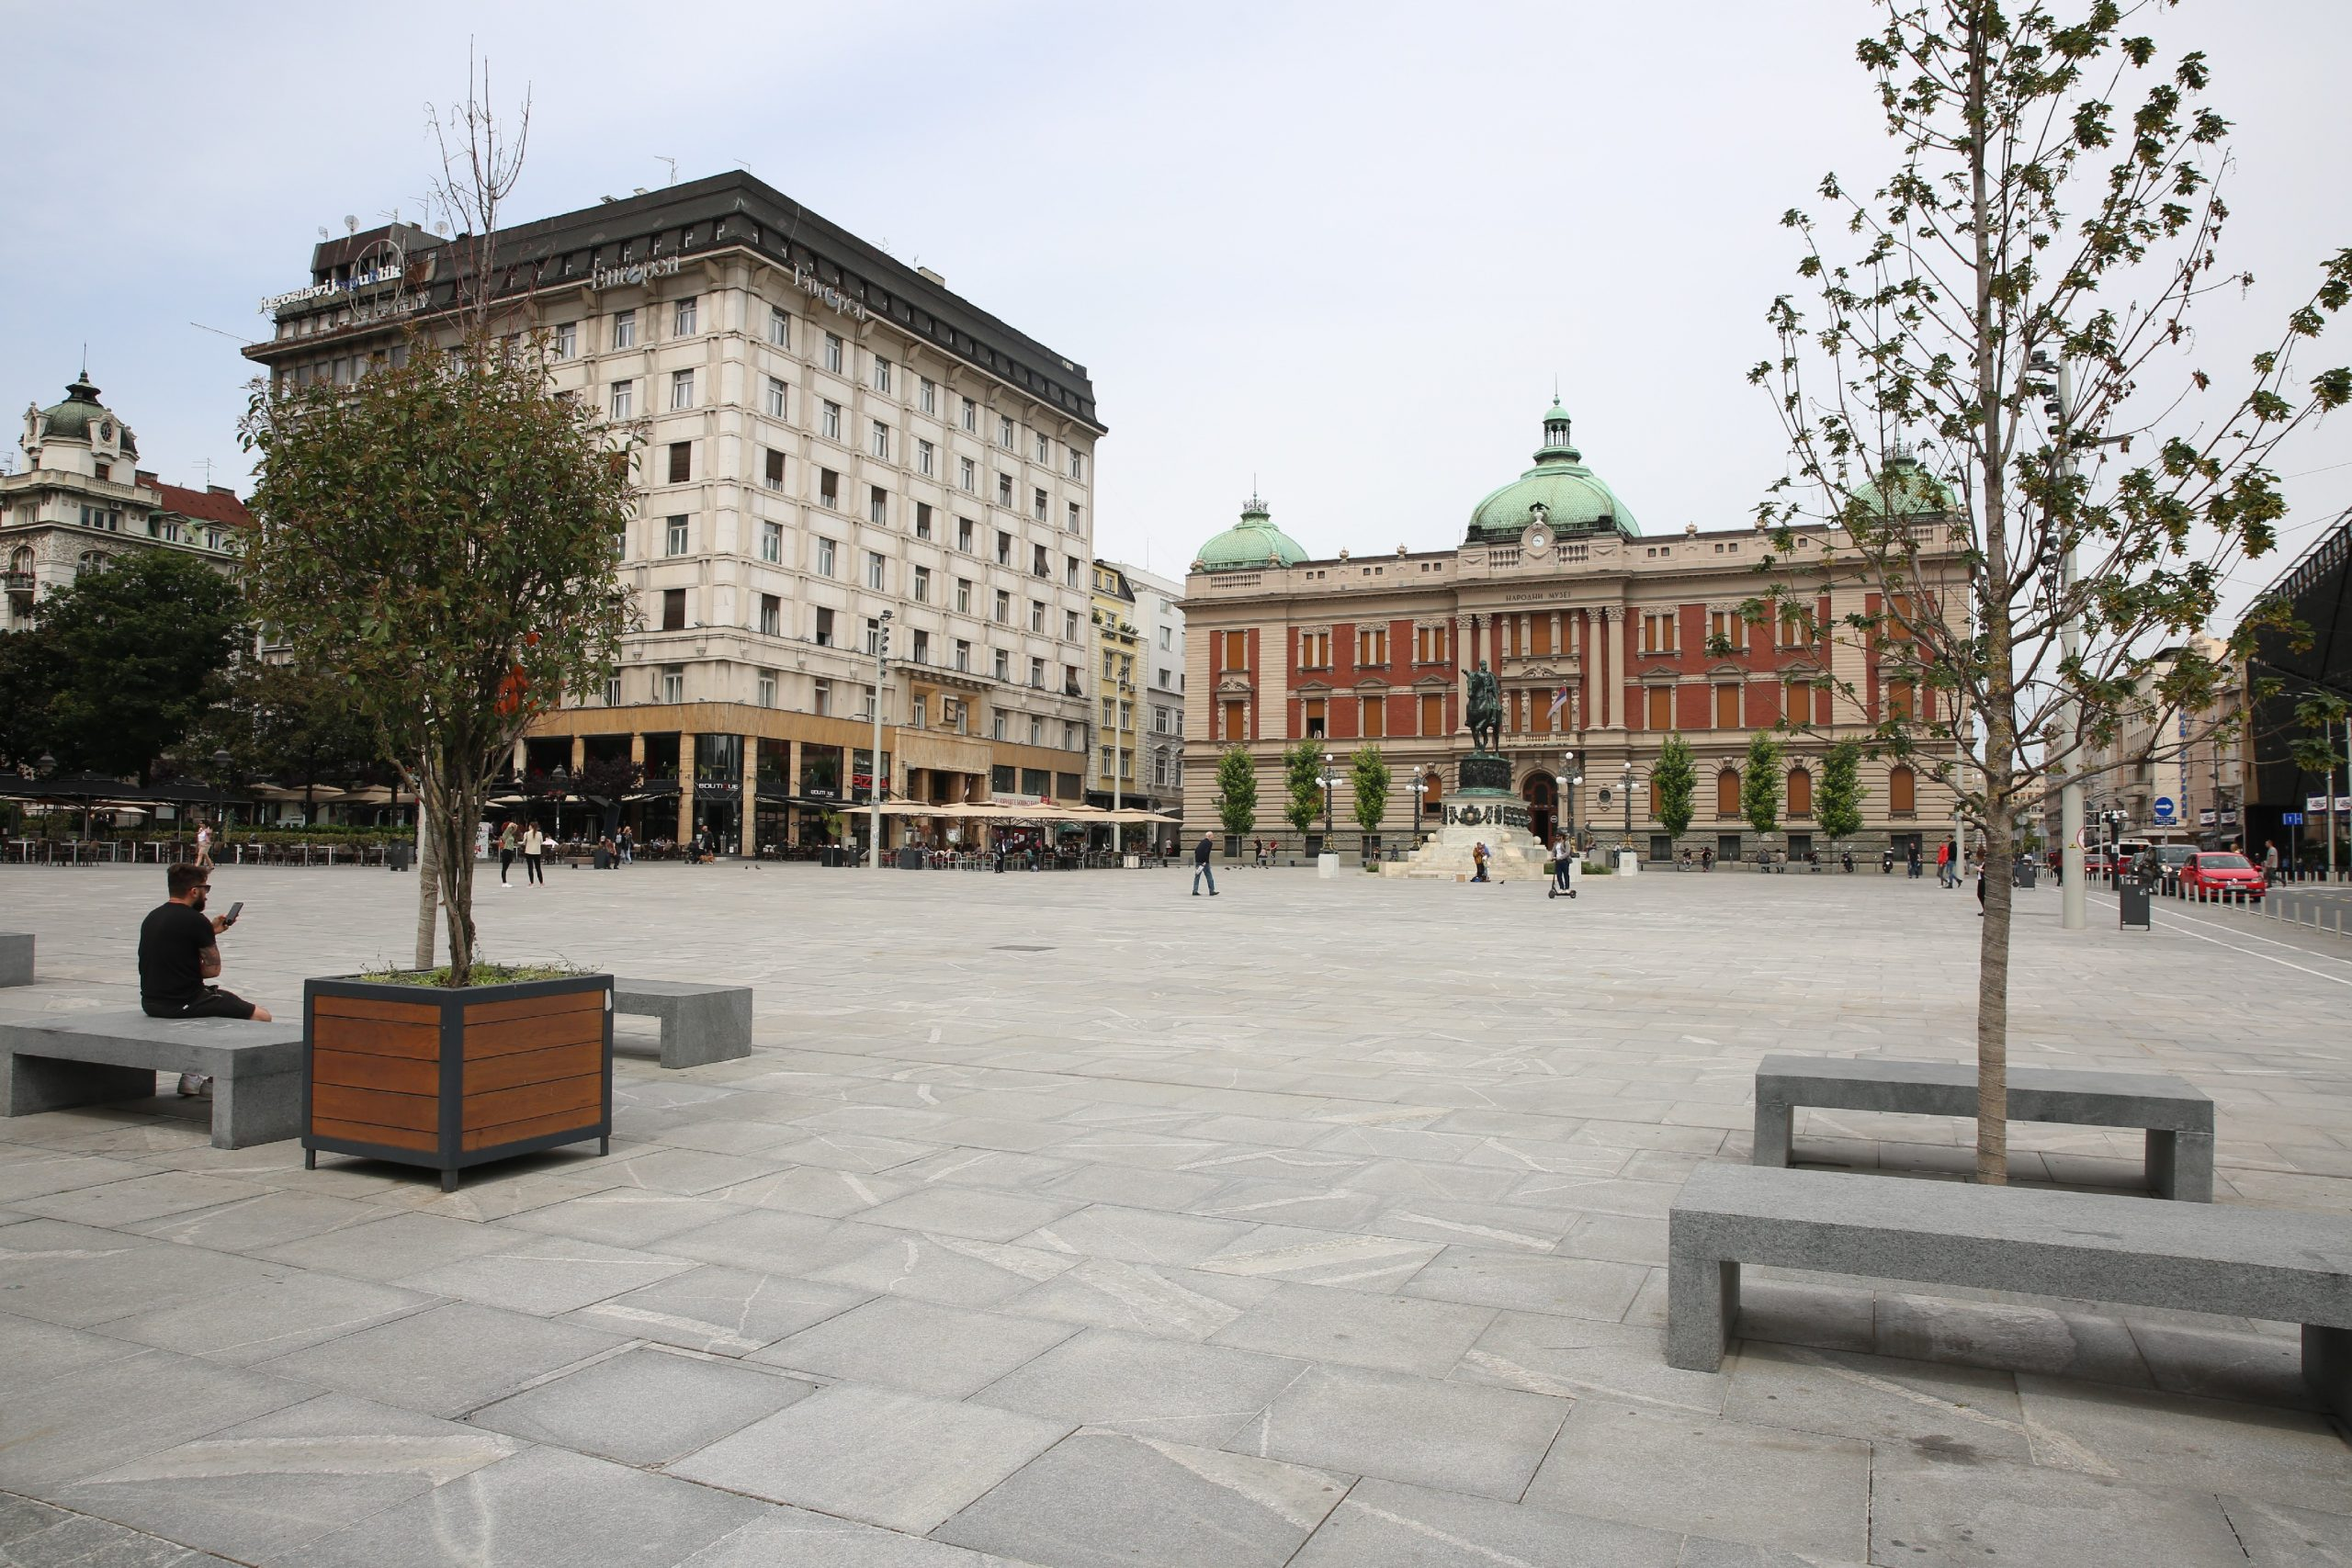 Trg Republike, Beograd 2020